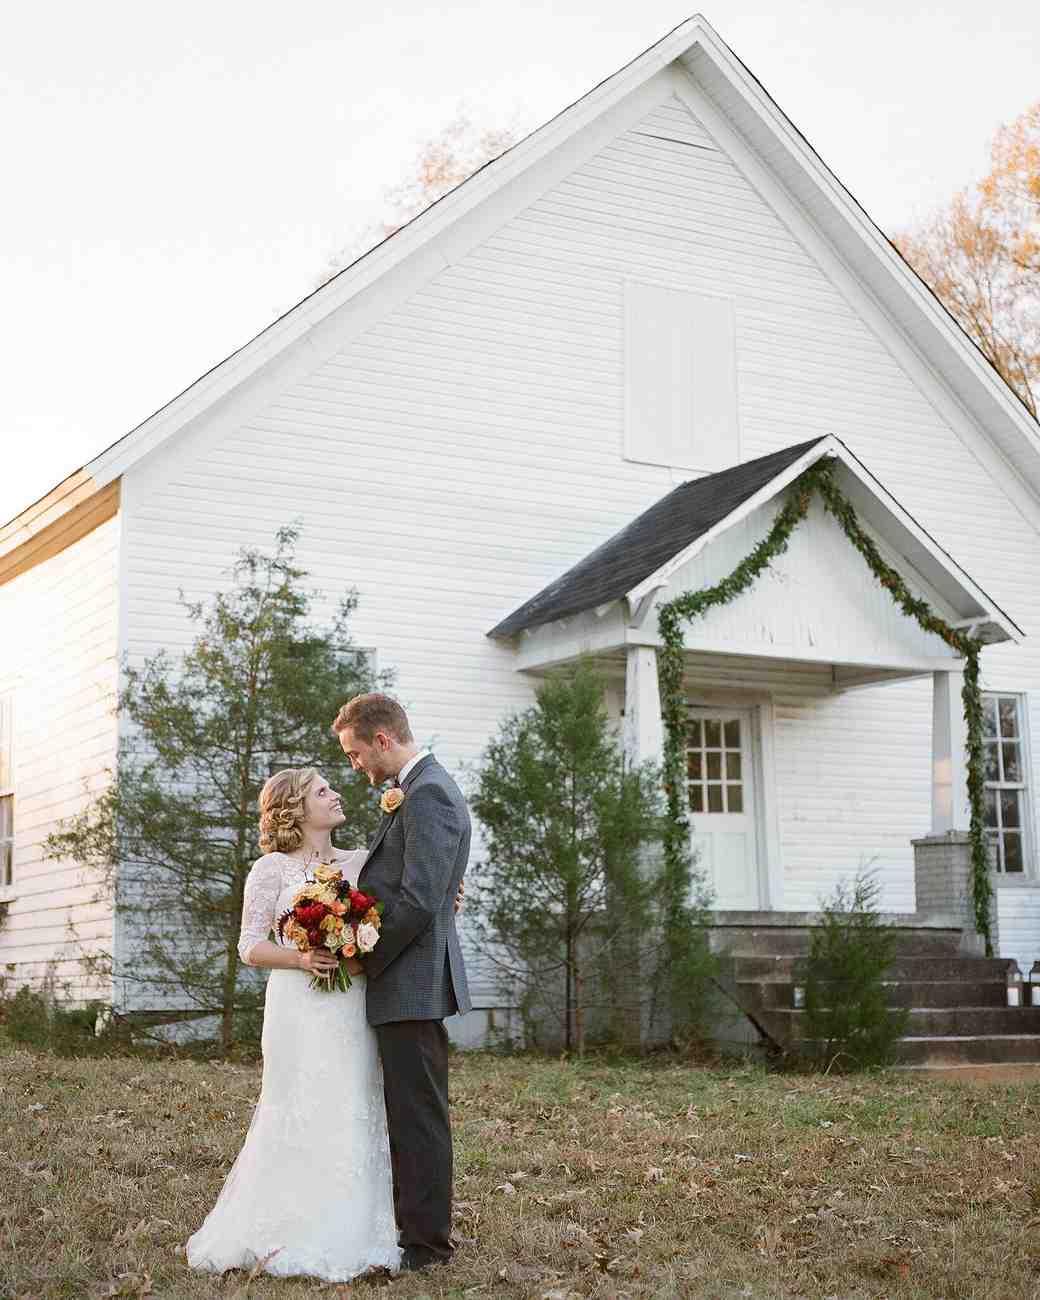 katie-nathan-wedding-thanksgiving-couple-312-s113017.jpg